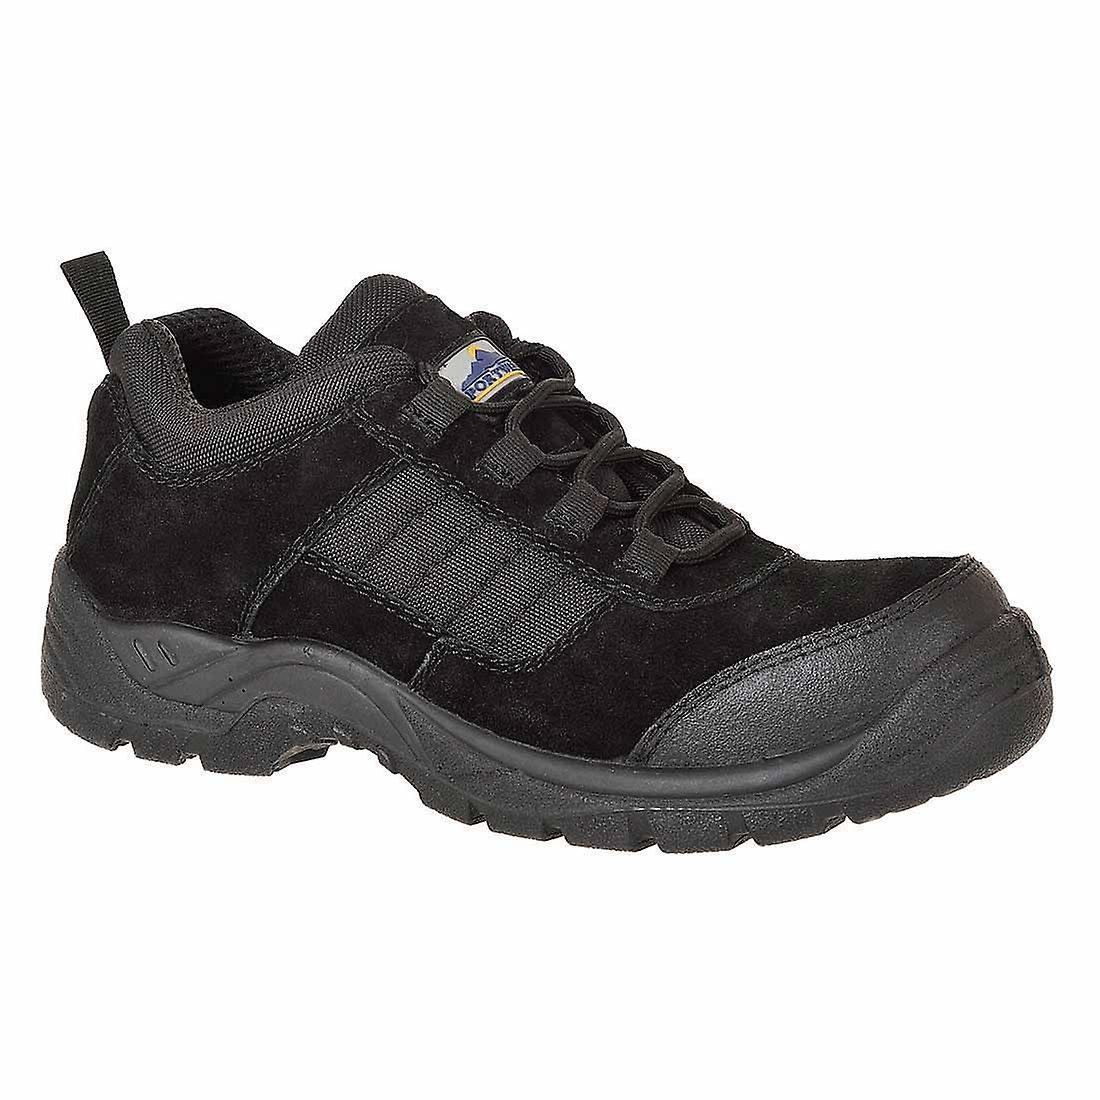 Portwest - Compositelite Trouper Workwear Safety Shoe S1